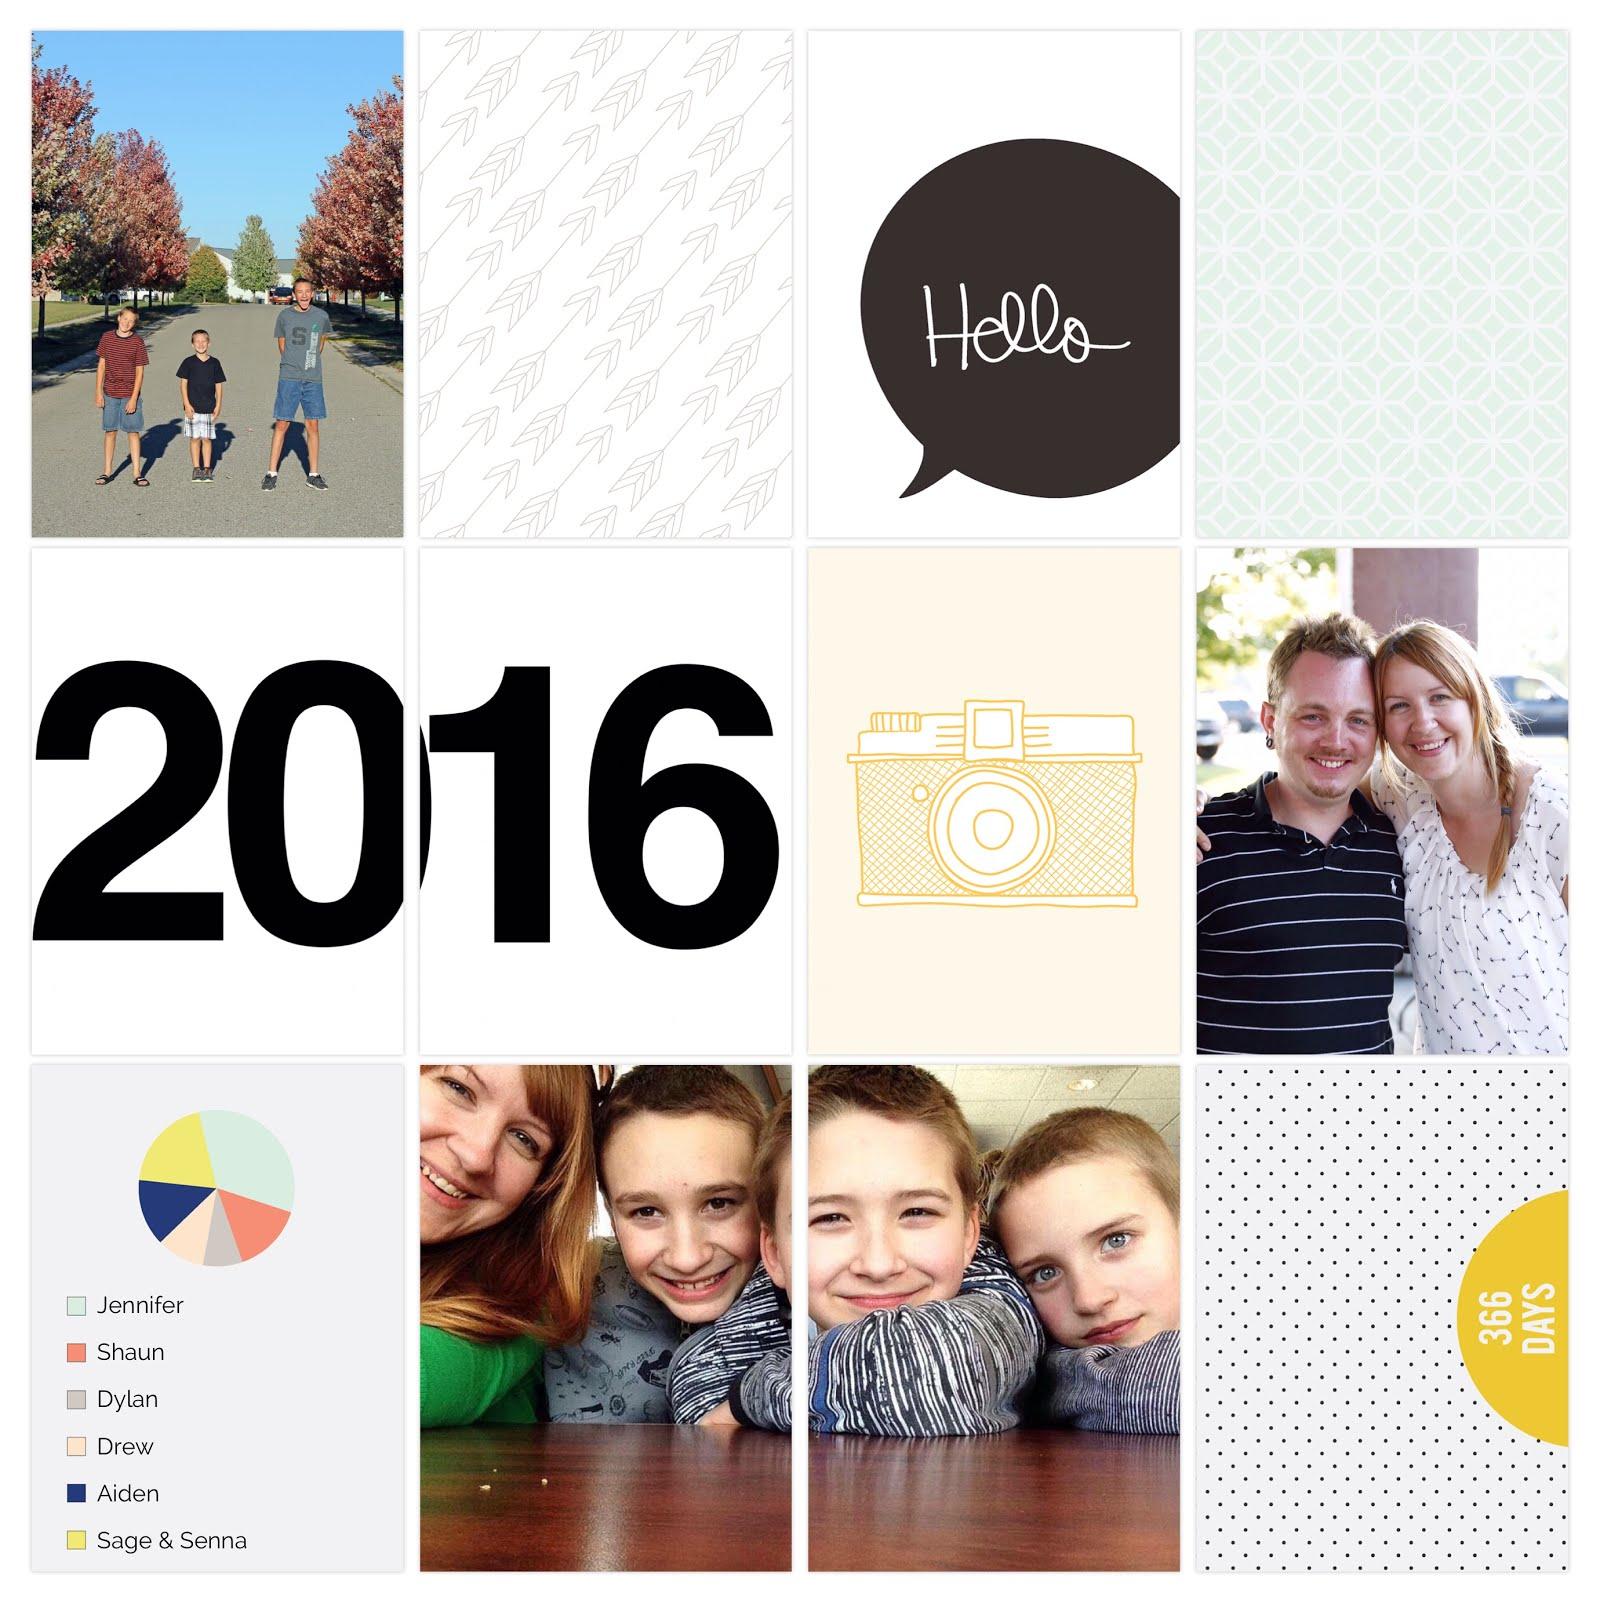 2016 Project Life Album